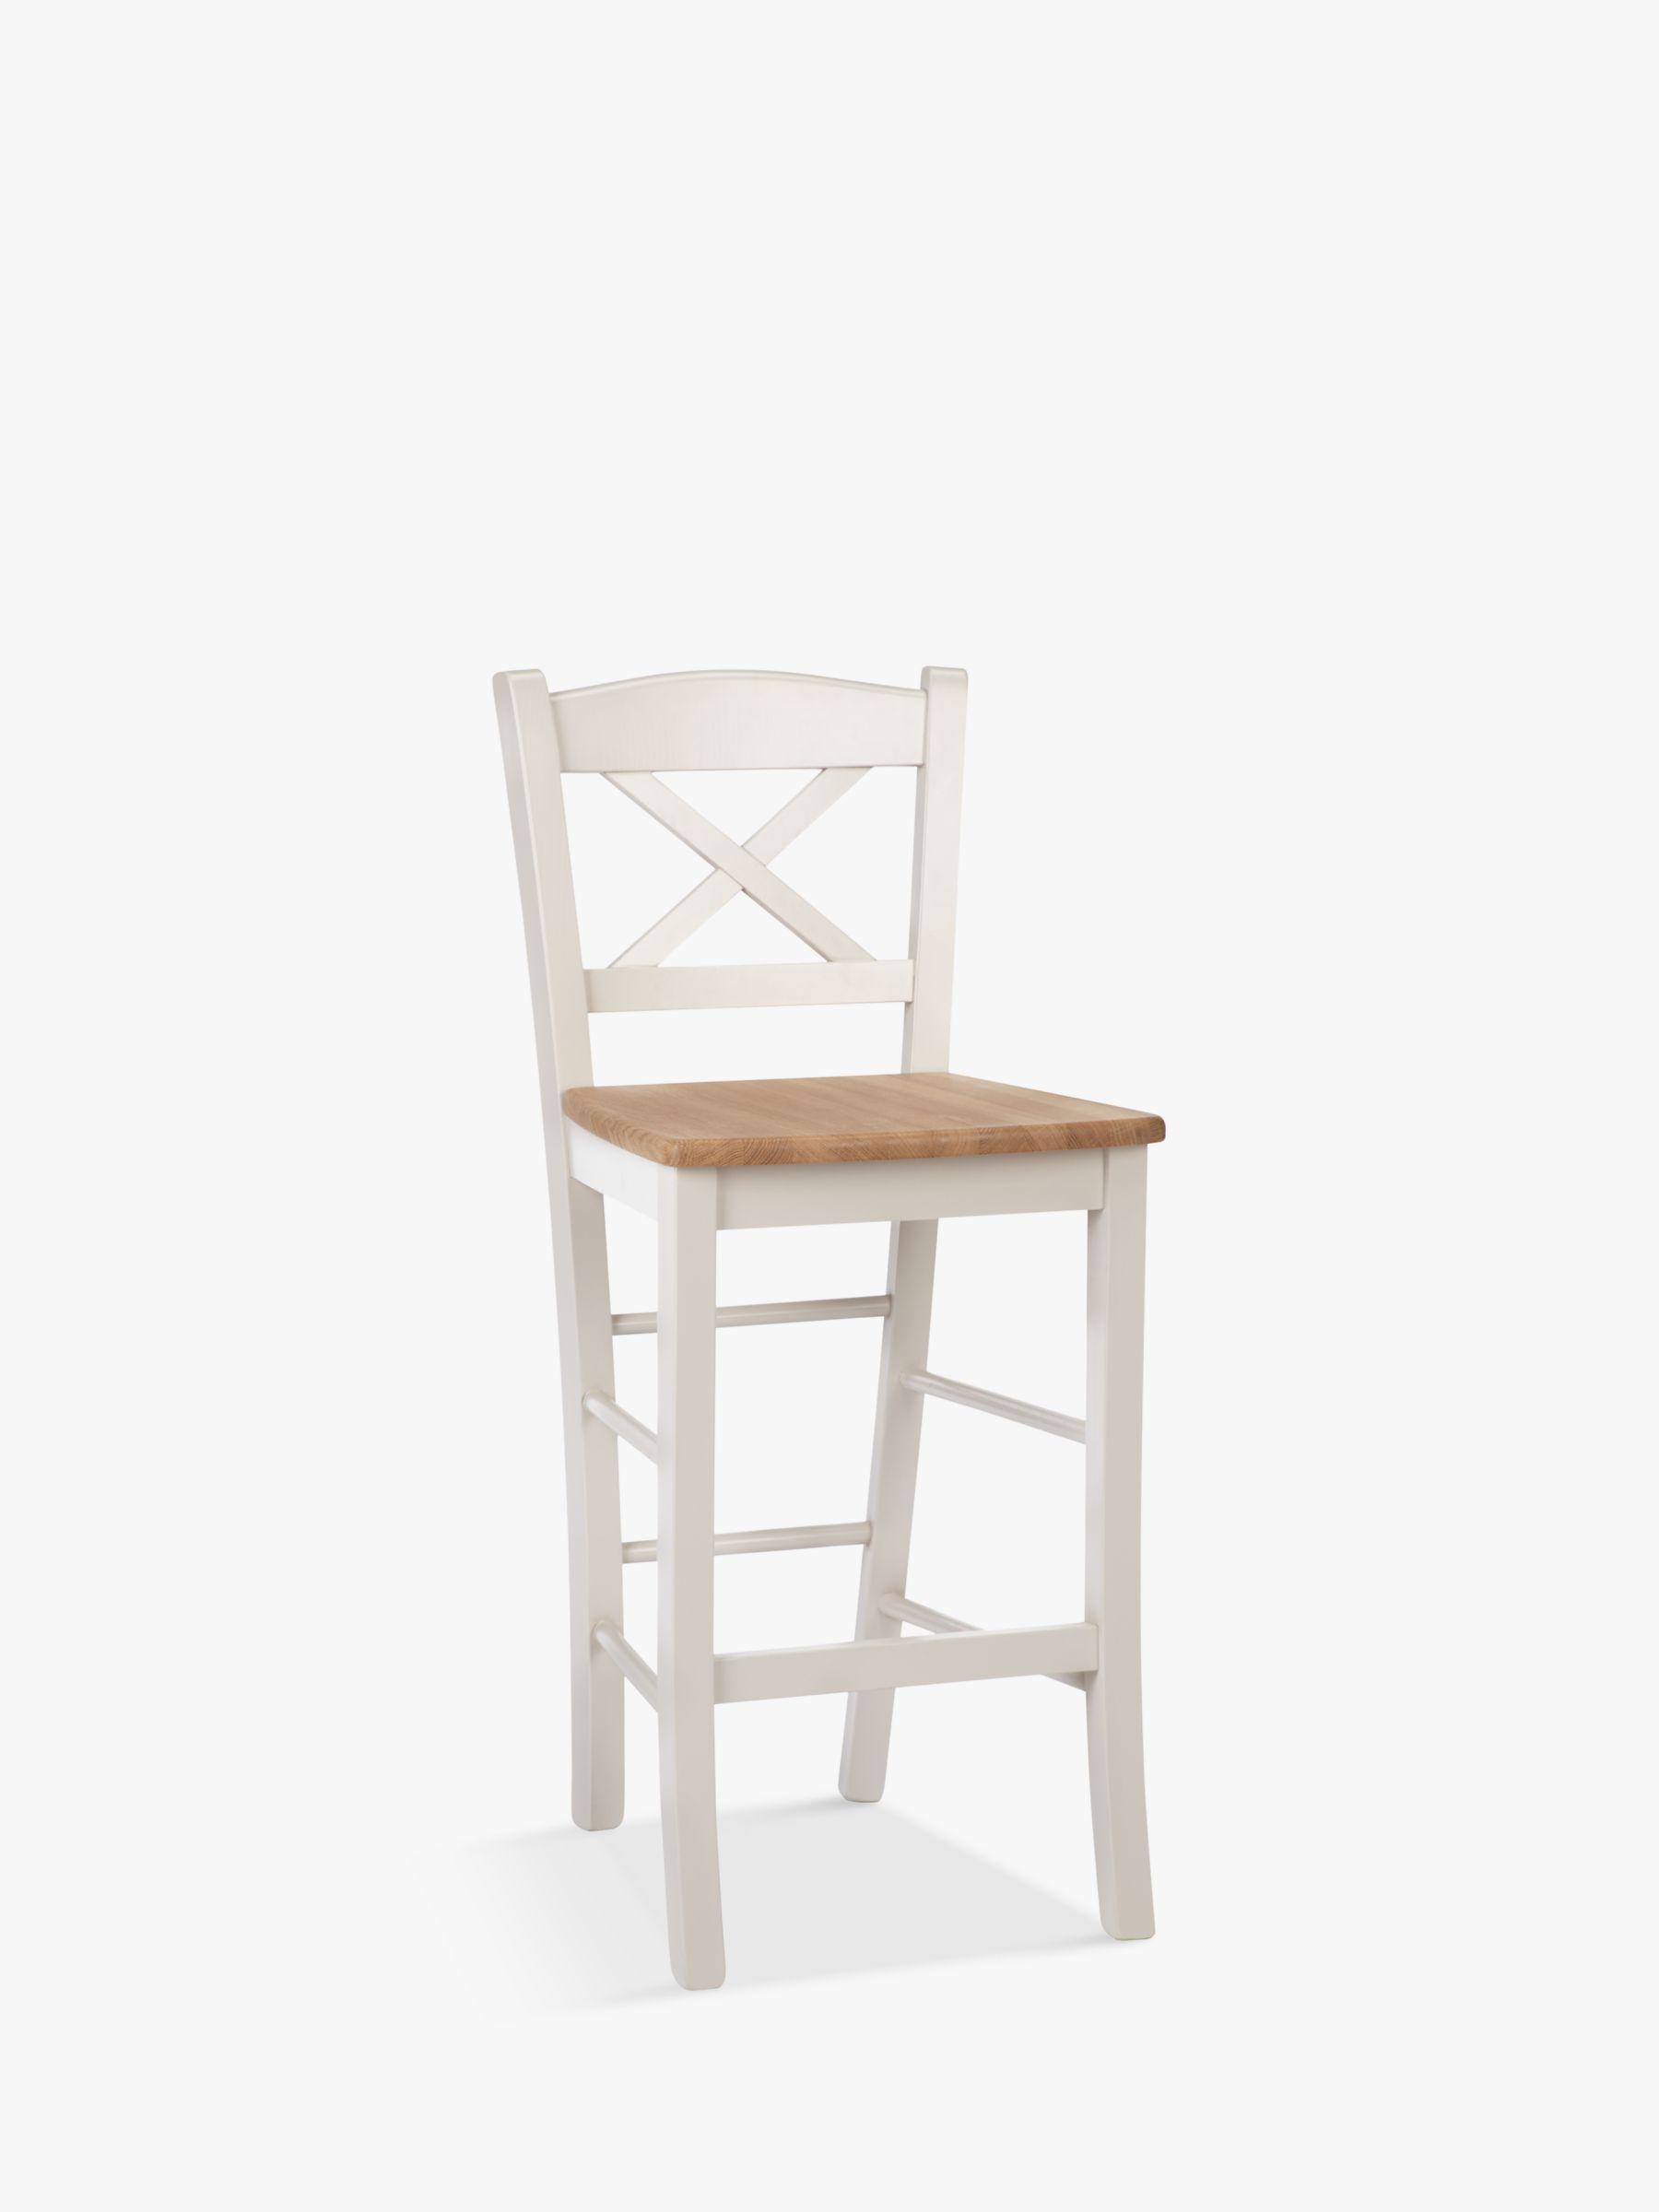 ANYDAY John Lewis & Partners Clayton Bar Chair, Cream, FSC Certified  Oak/Beech